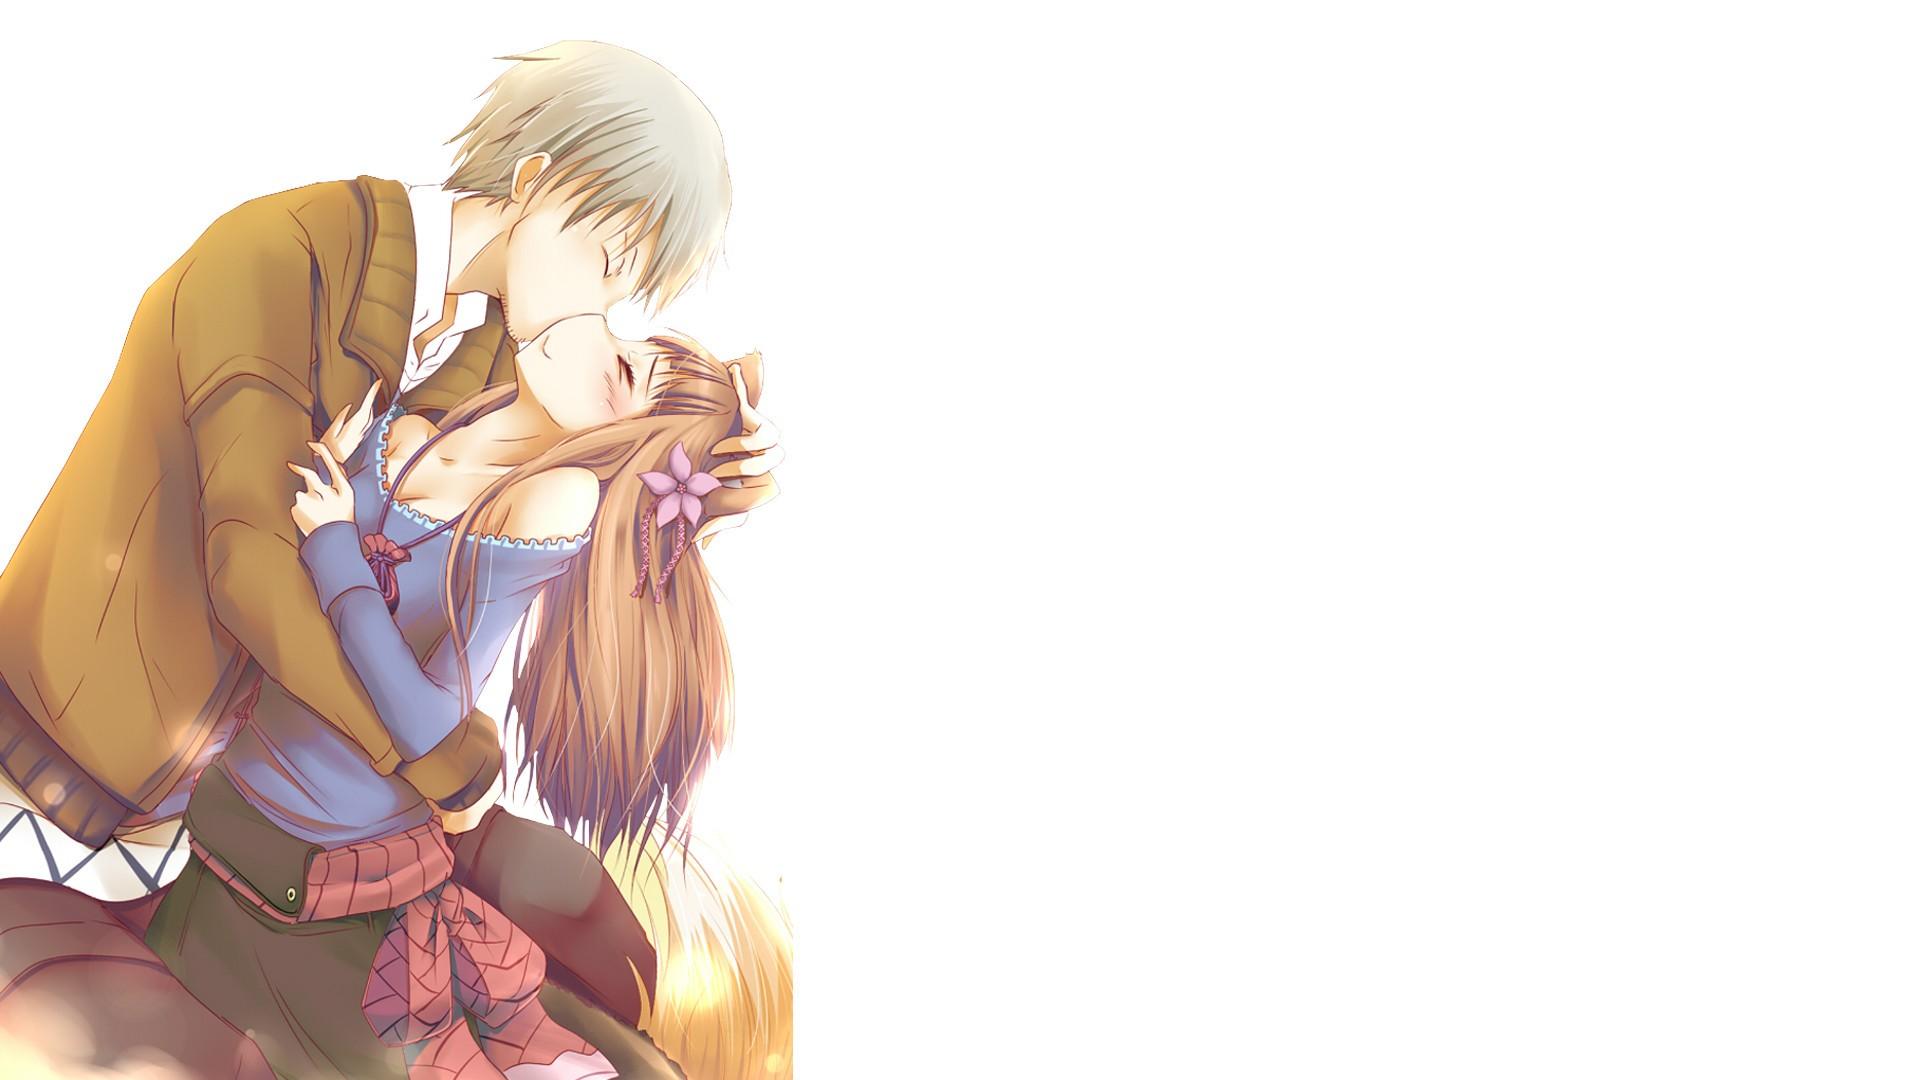 Anime Girls Boys Cartoon Kissing Holo Spice And Wolf Okamimimi Lawrence Kraft Hand Finger